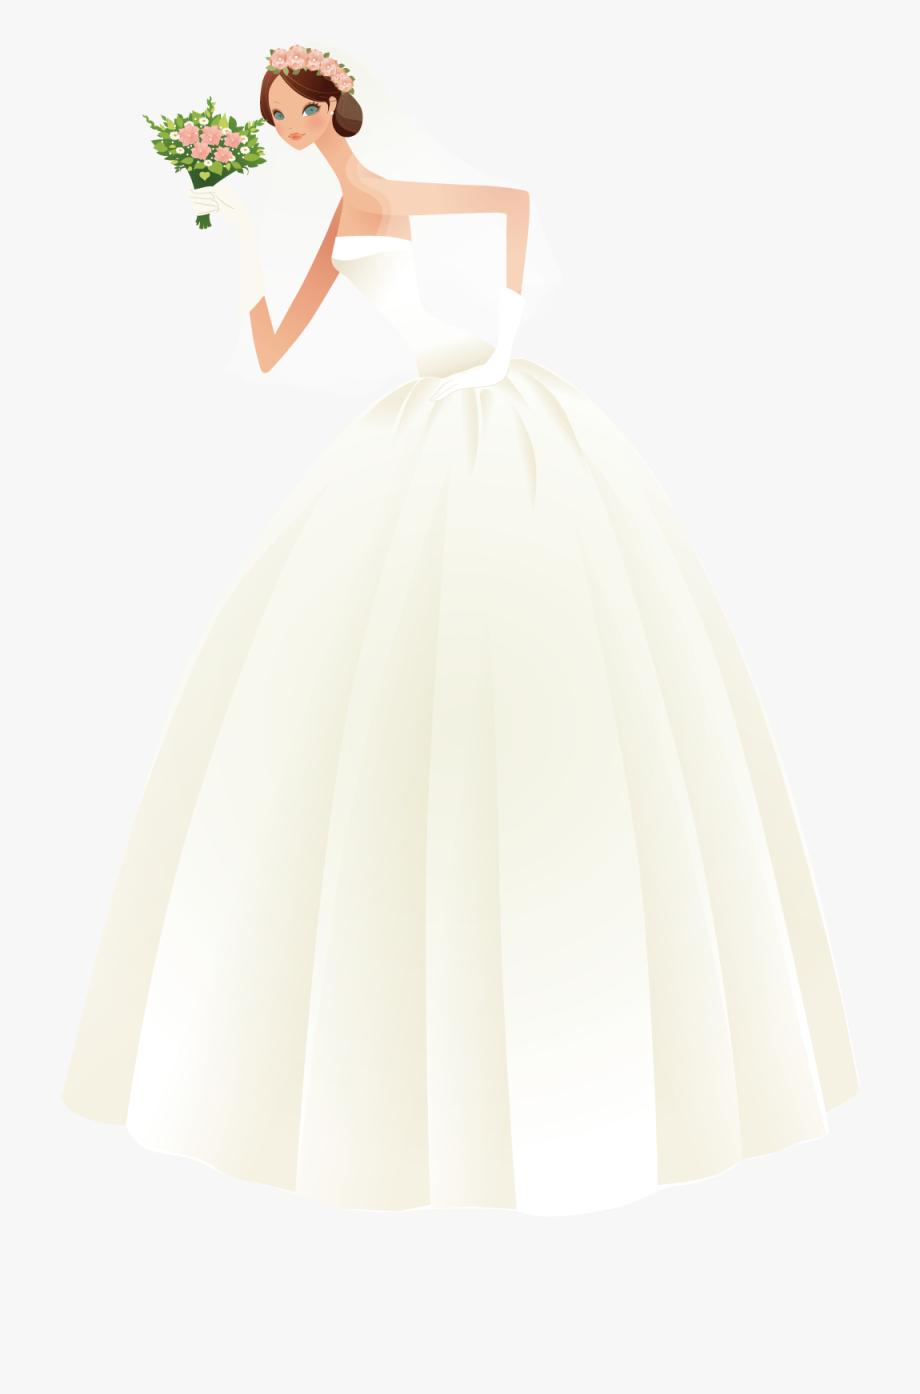 Bride Dress Png.